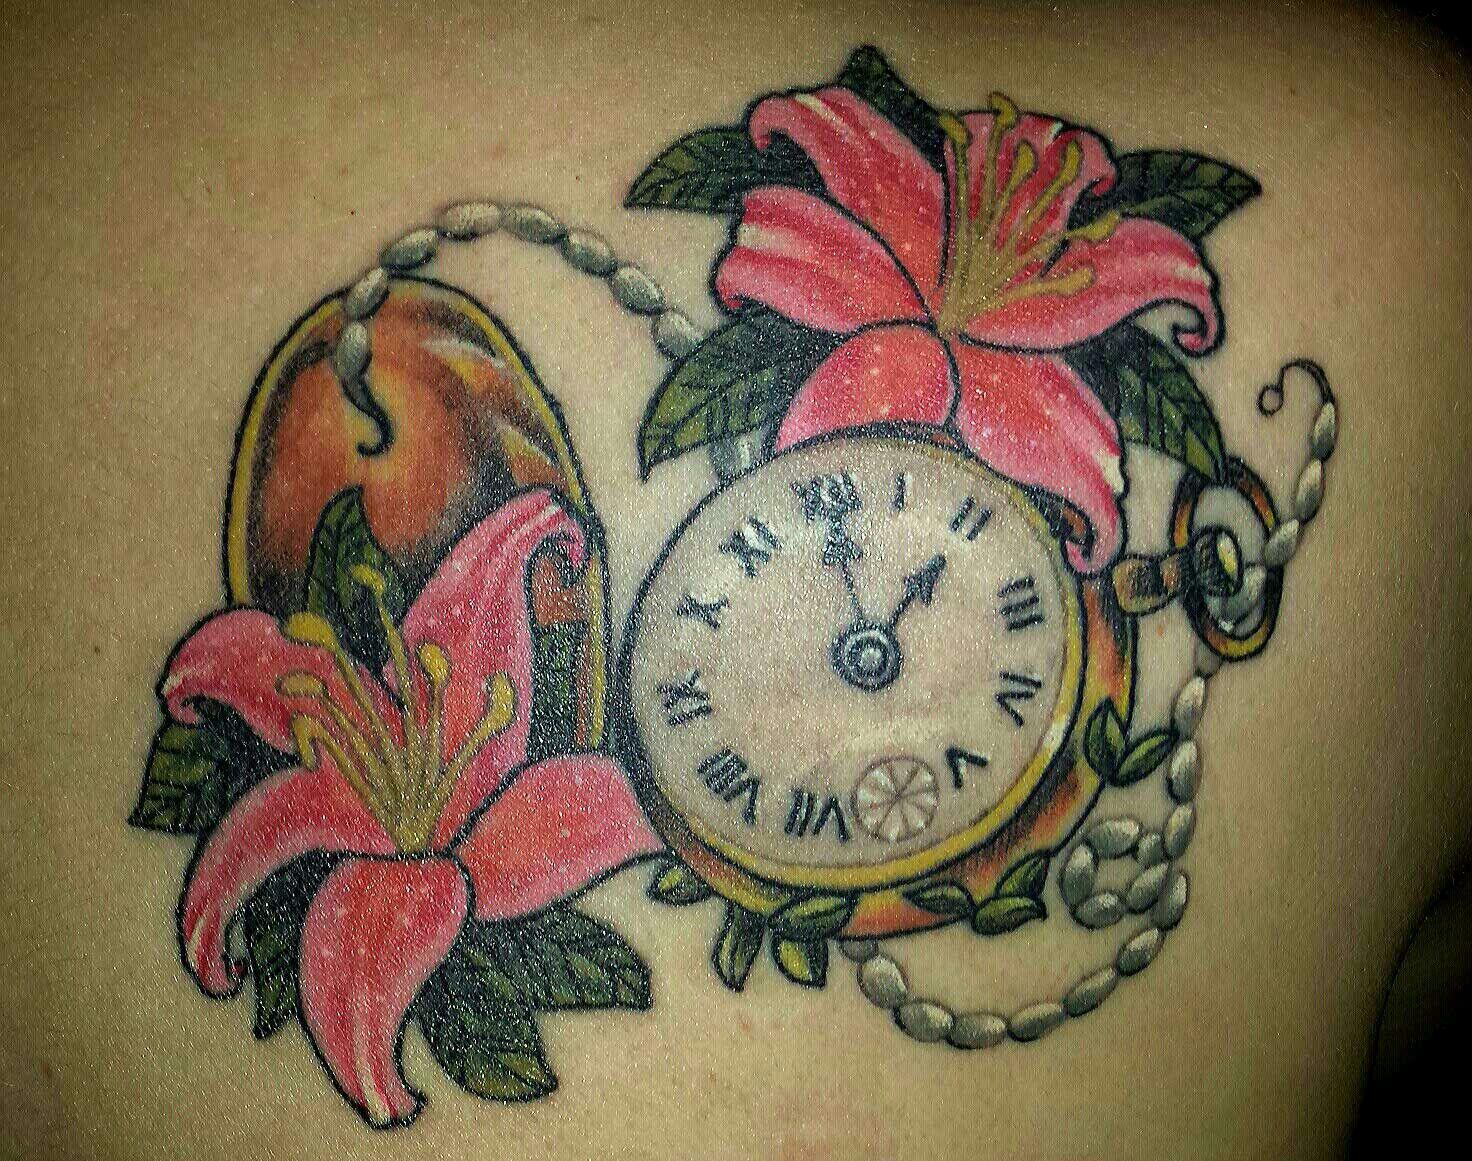 dd8866d79 Pocket watch with lilies tattoo | Tattoos